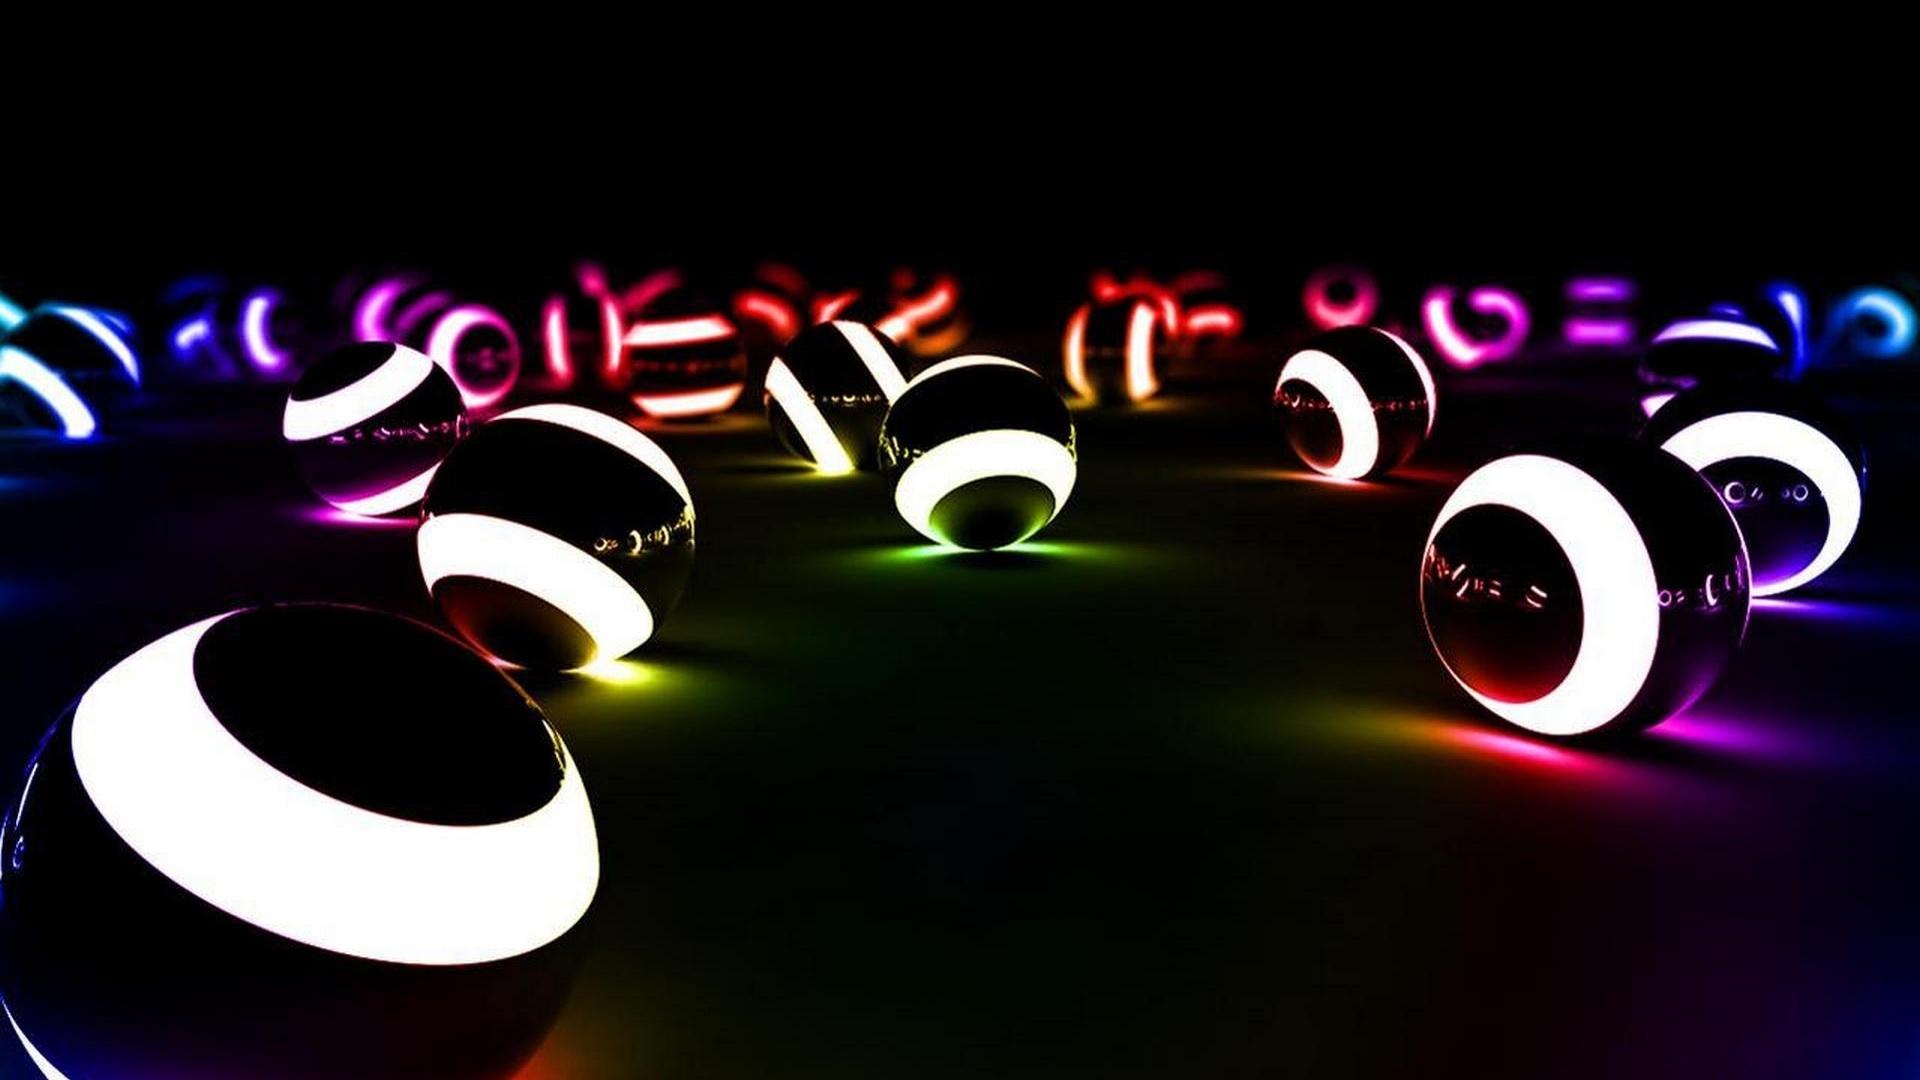 Neon Balloon Desktop Wallpaper